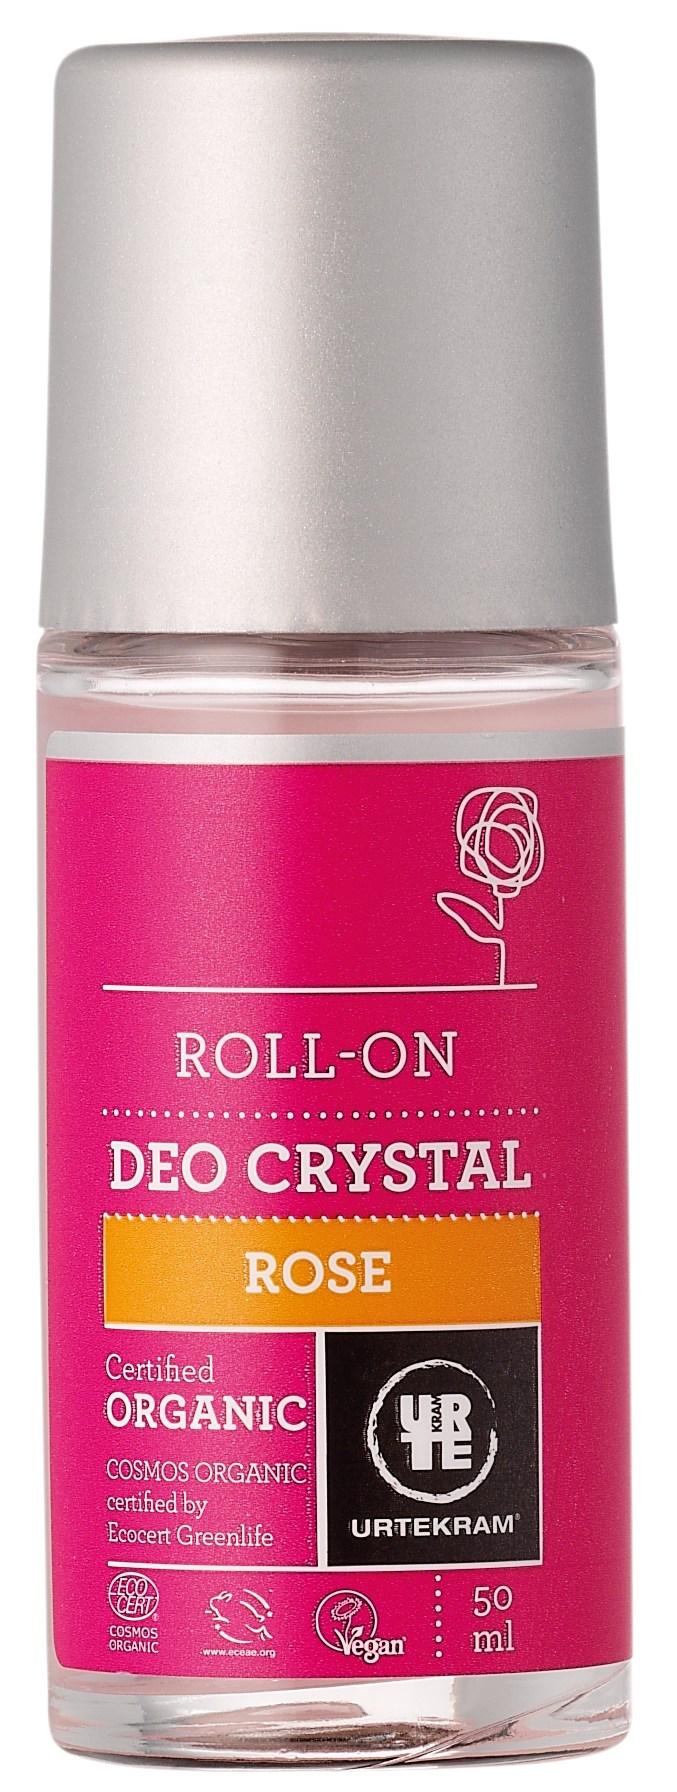 Urtekram Rose Deo Krystal Roll-On - 50 ml